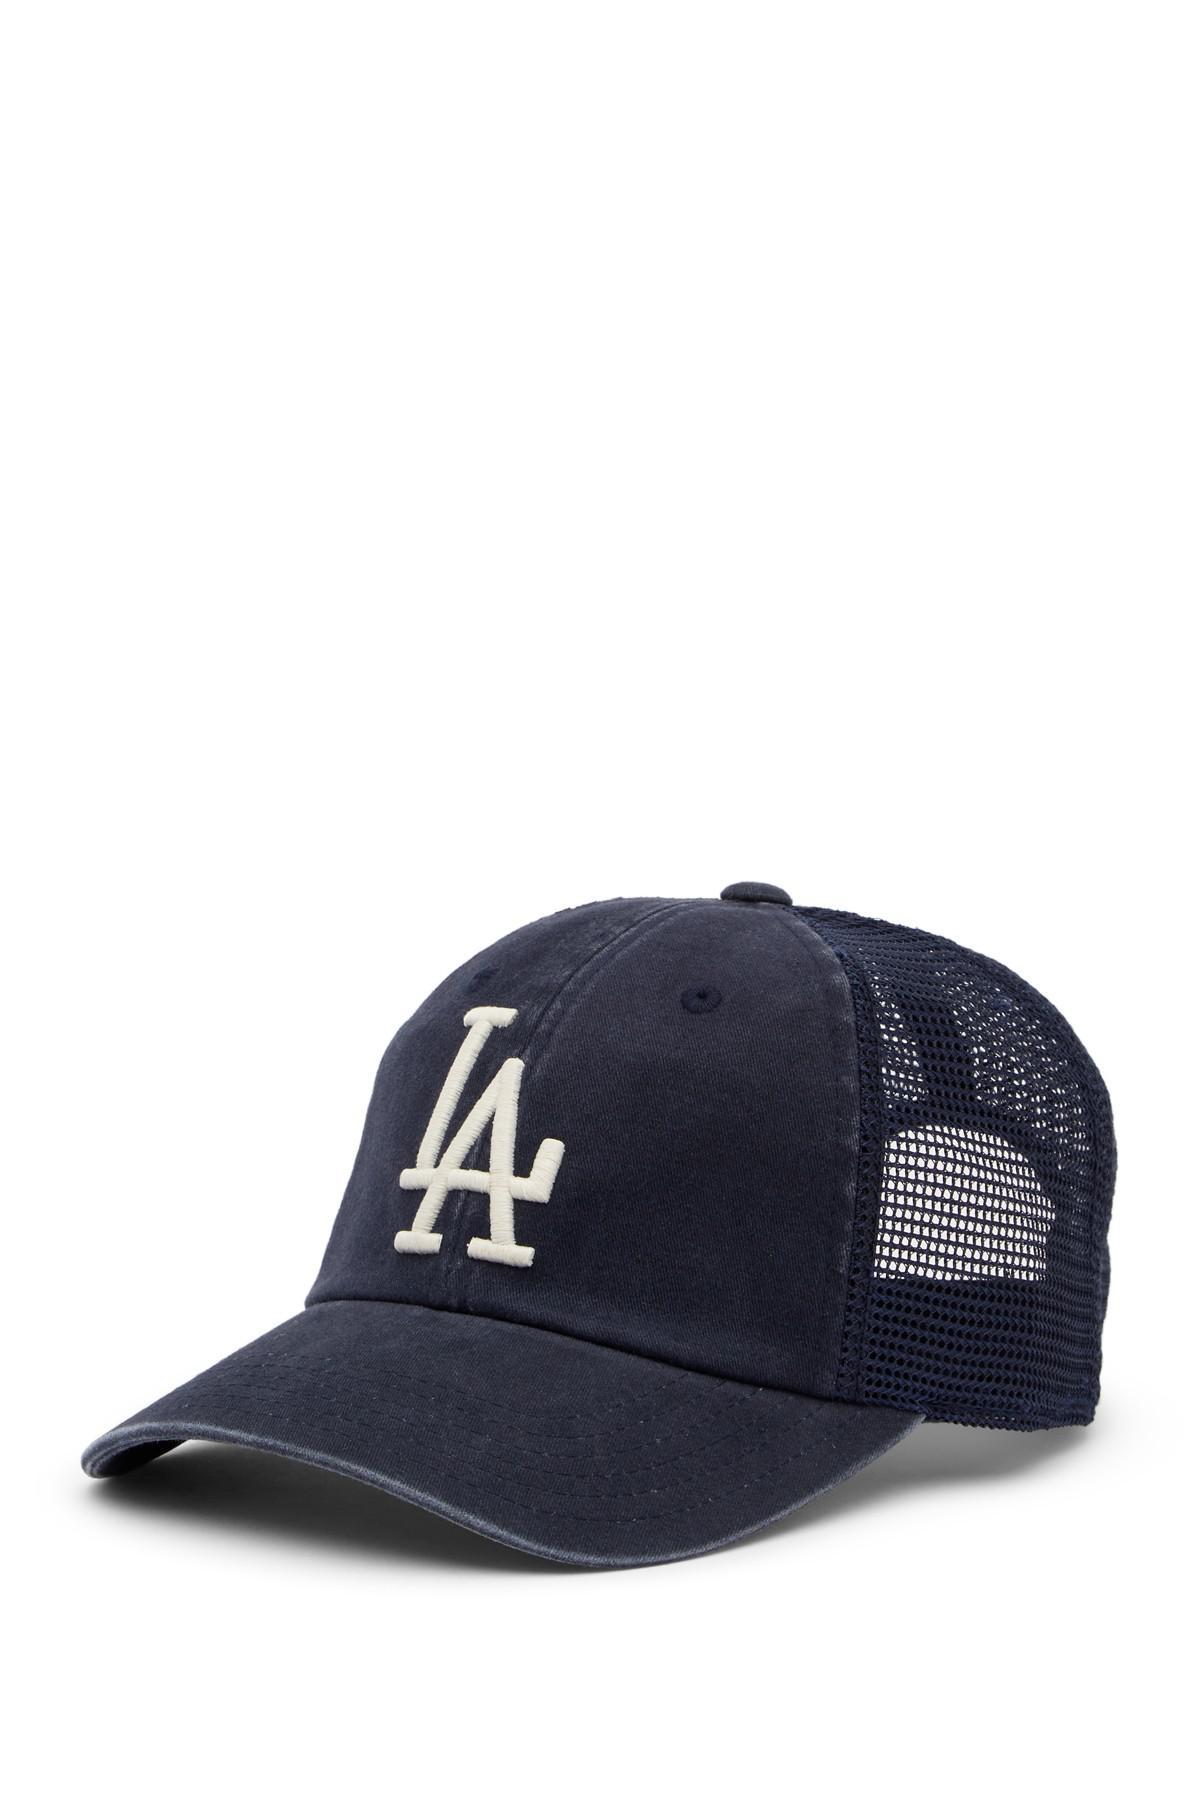 Lyst - American Needle Los Angeles Dodgers Raglan Bones Mesh ... a70290328ed5